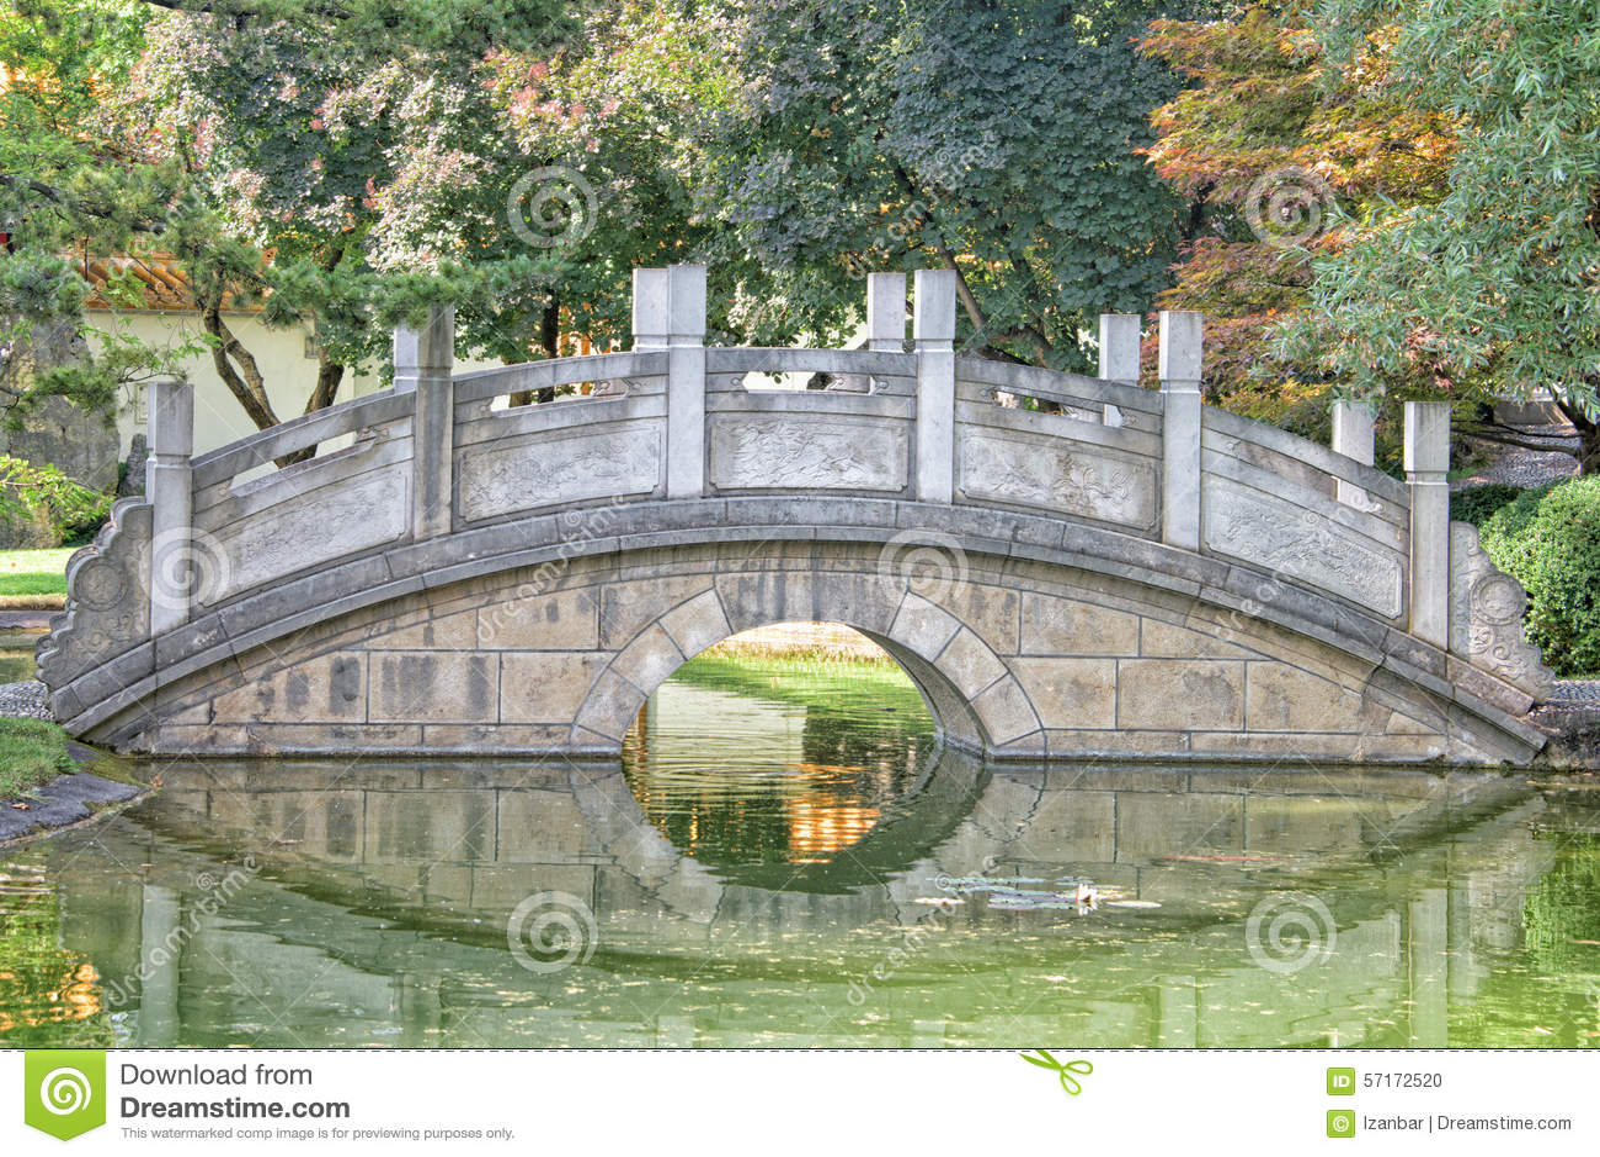 Chinese Garden Bridge Detail View Stock Photo - Image: 57172520